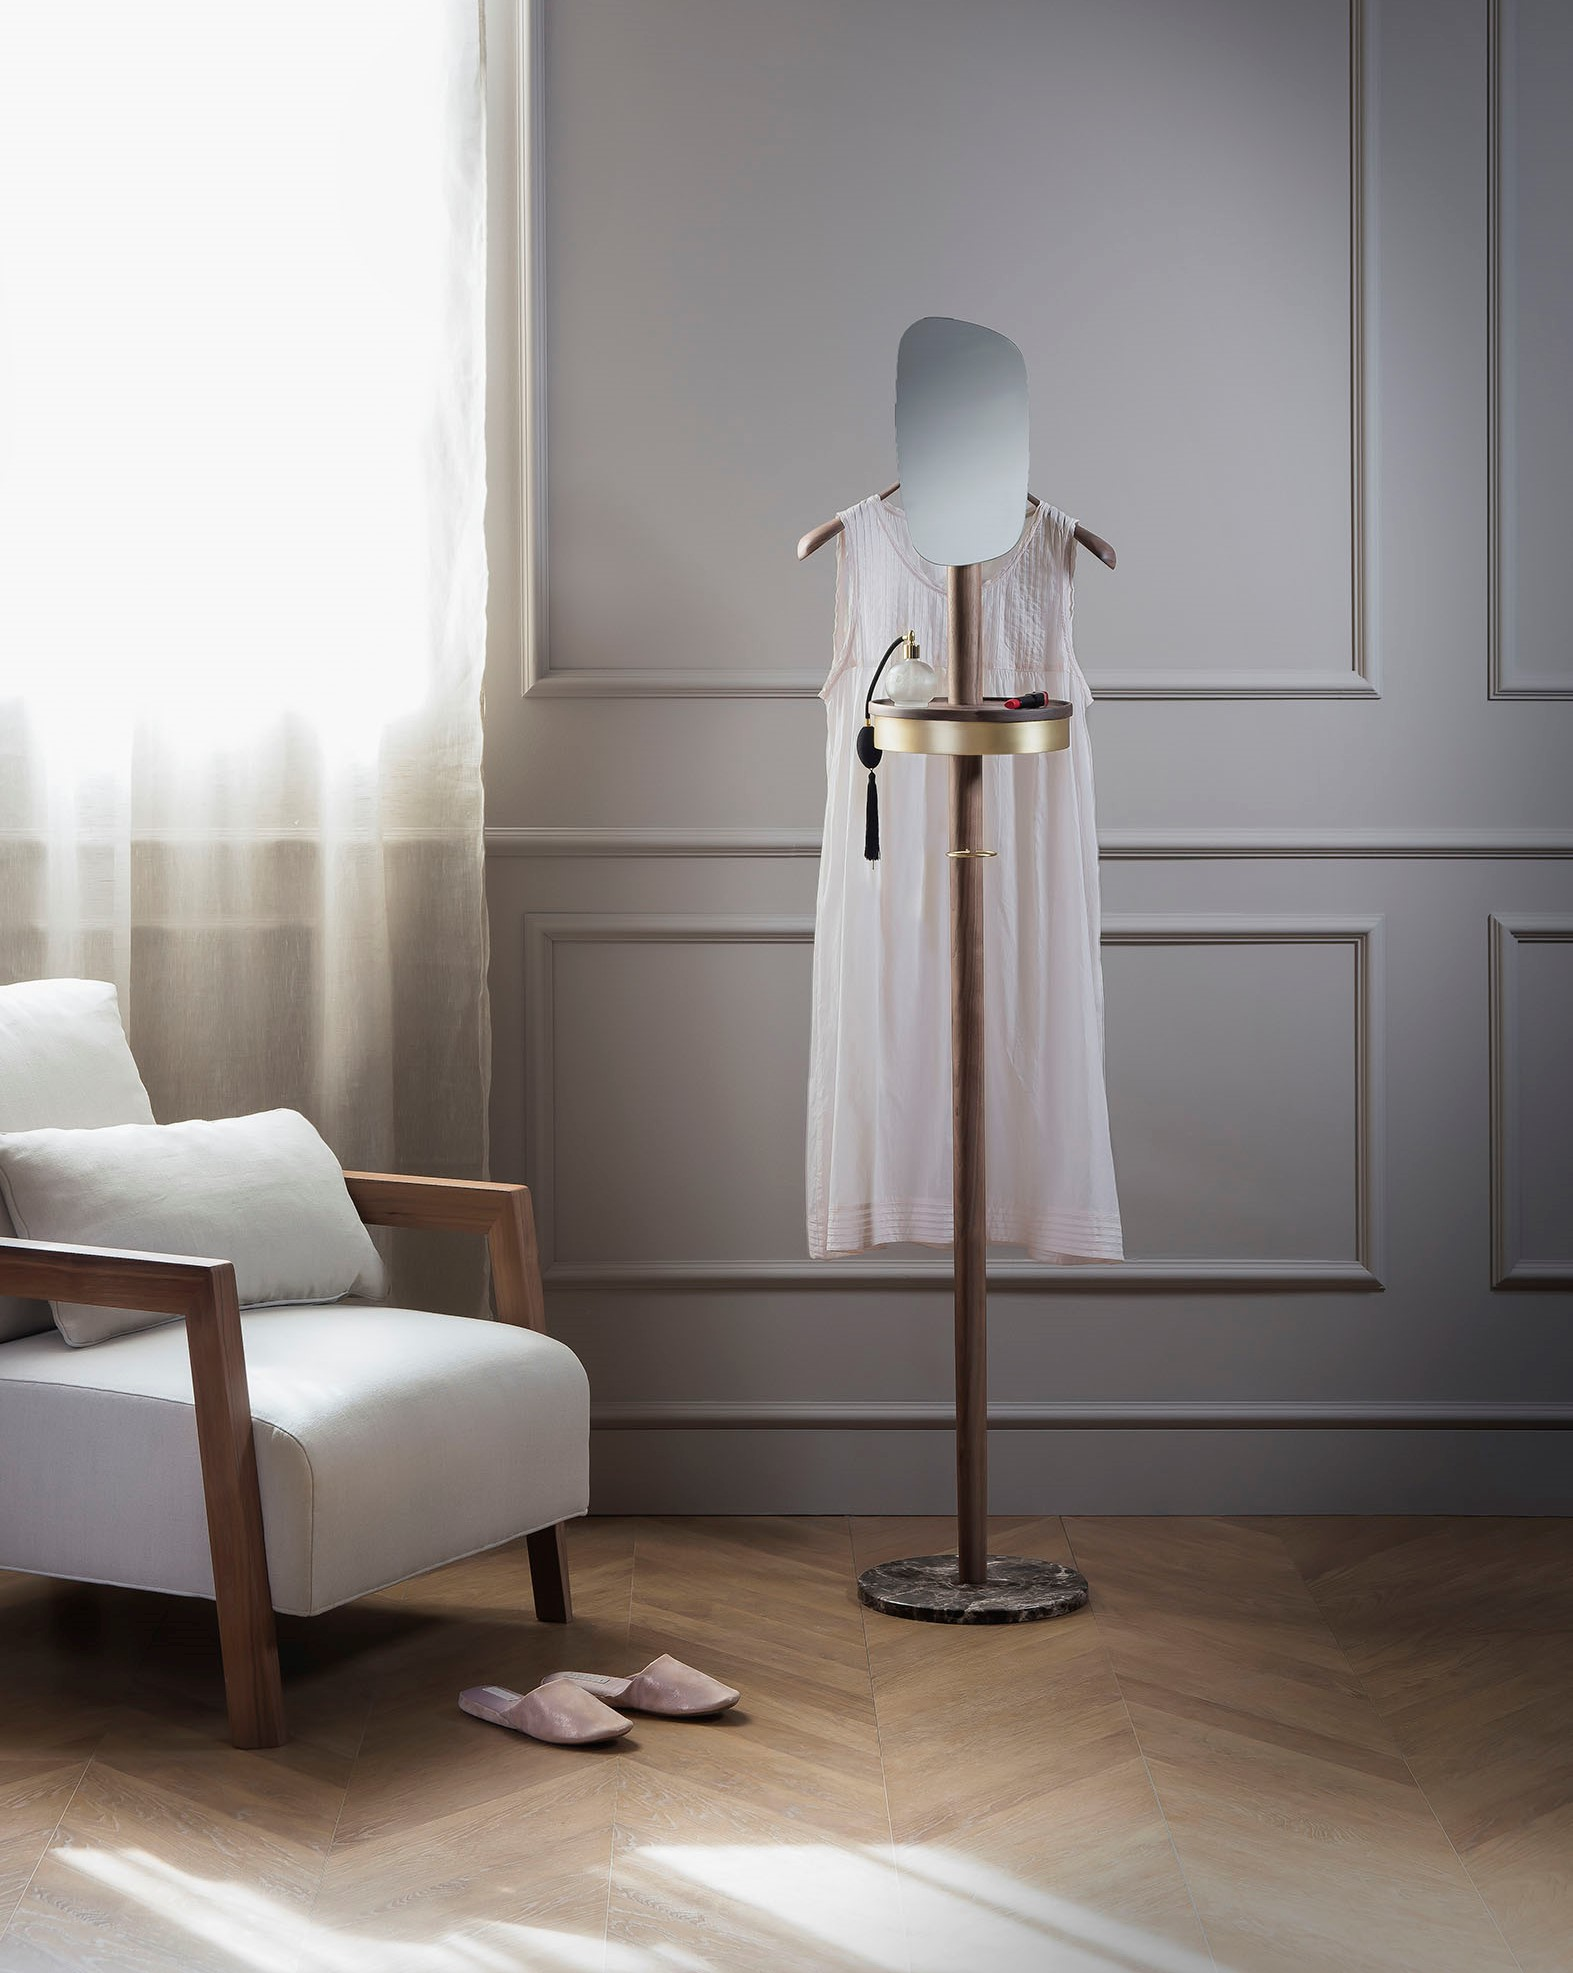 dress_sofa_wall_window_brass